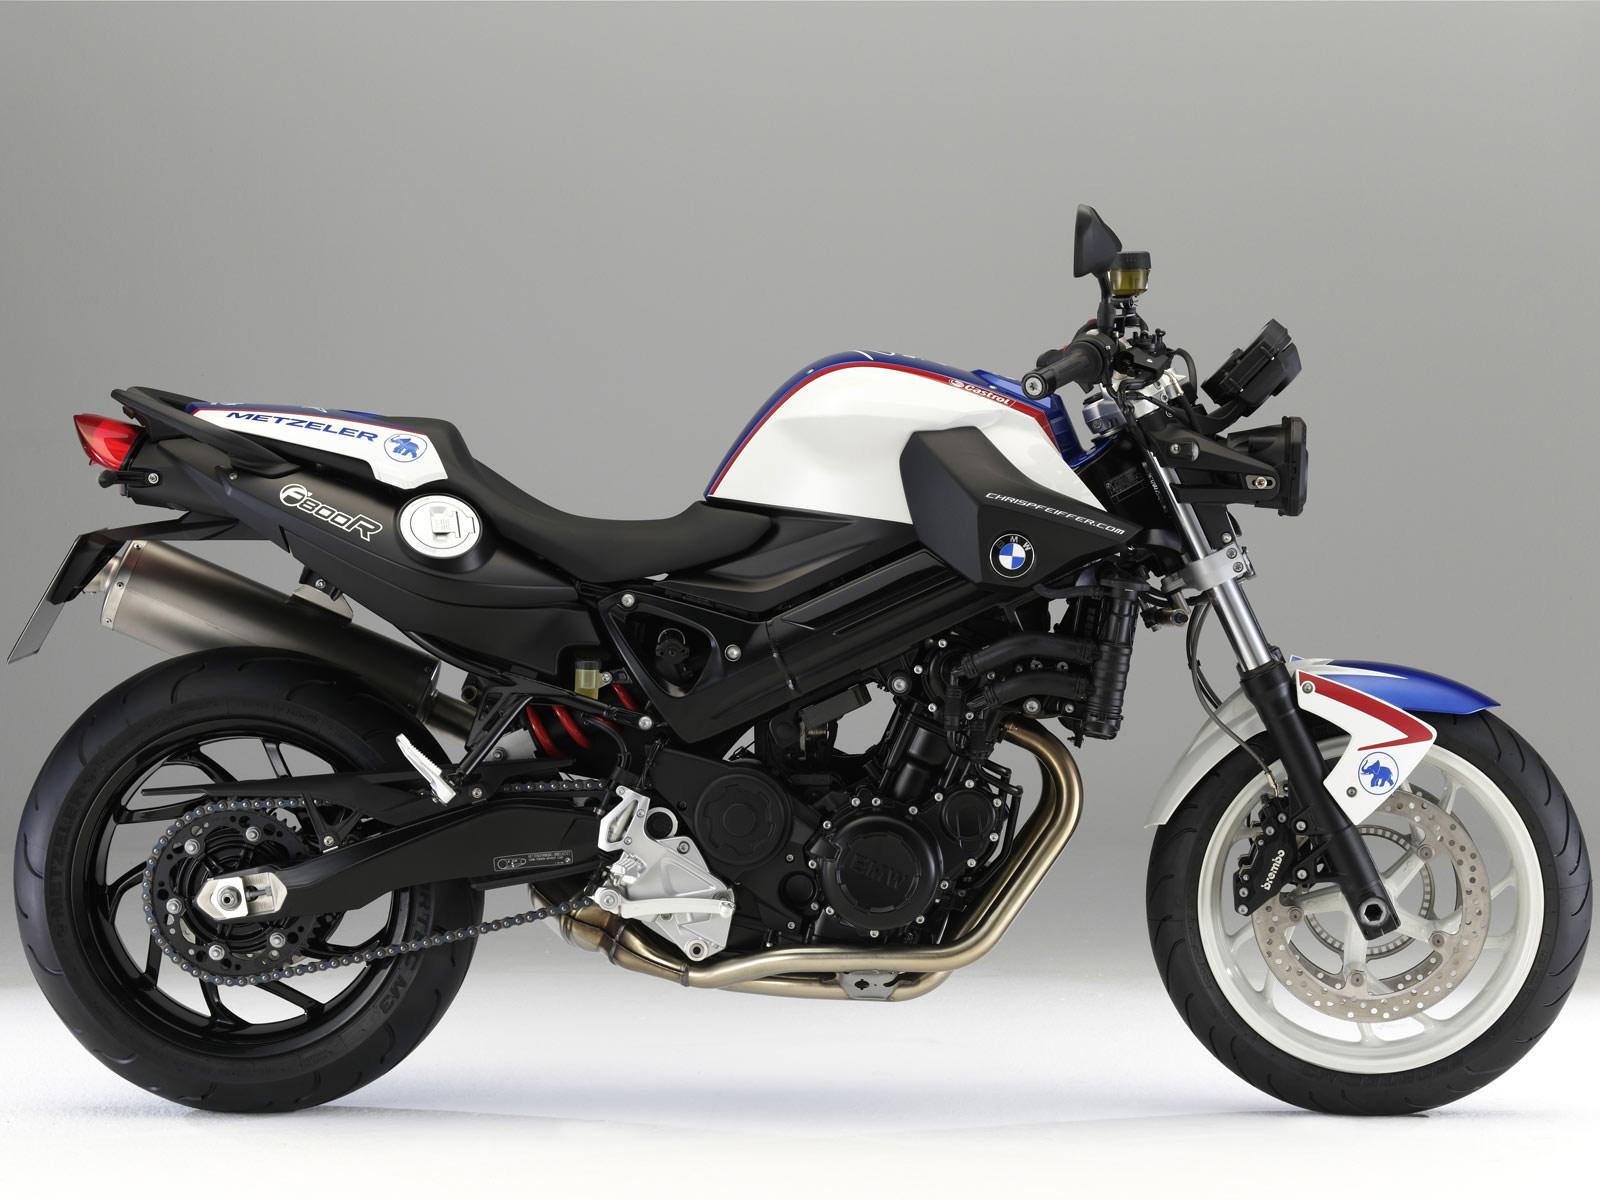 2009 BMW F800R Motorcycle Desktop Wallpaper